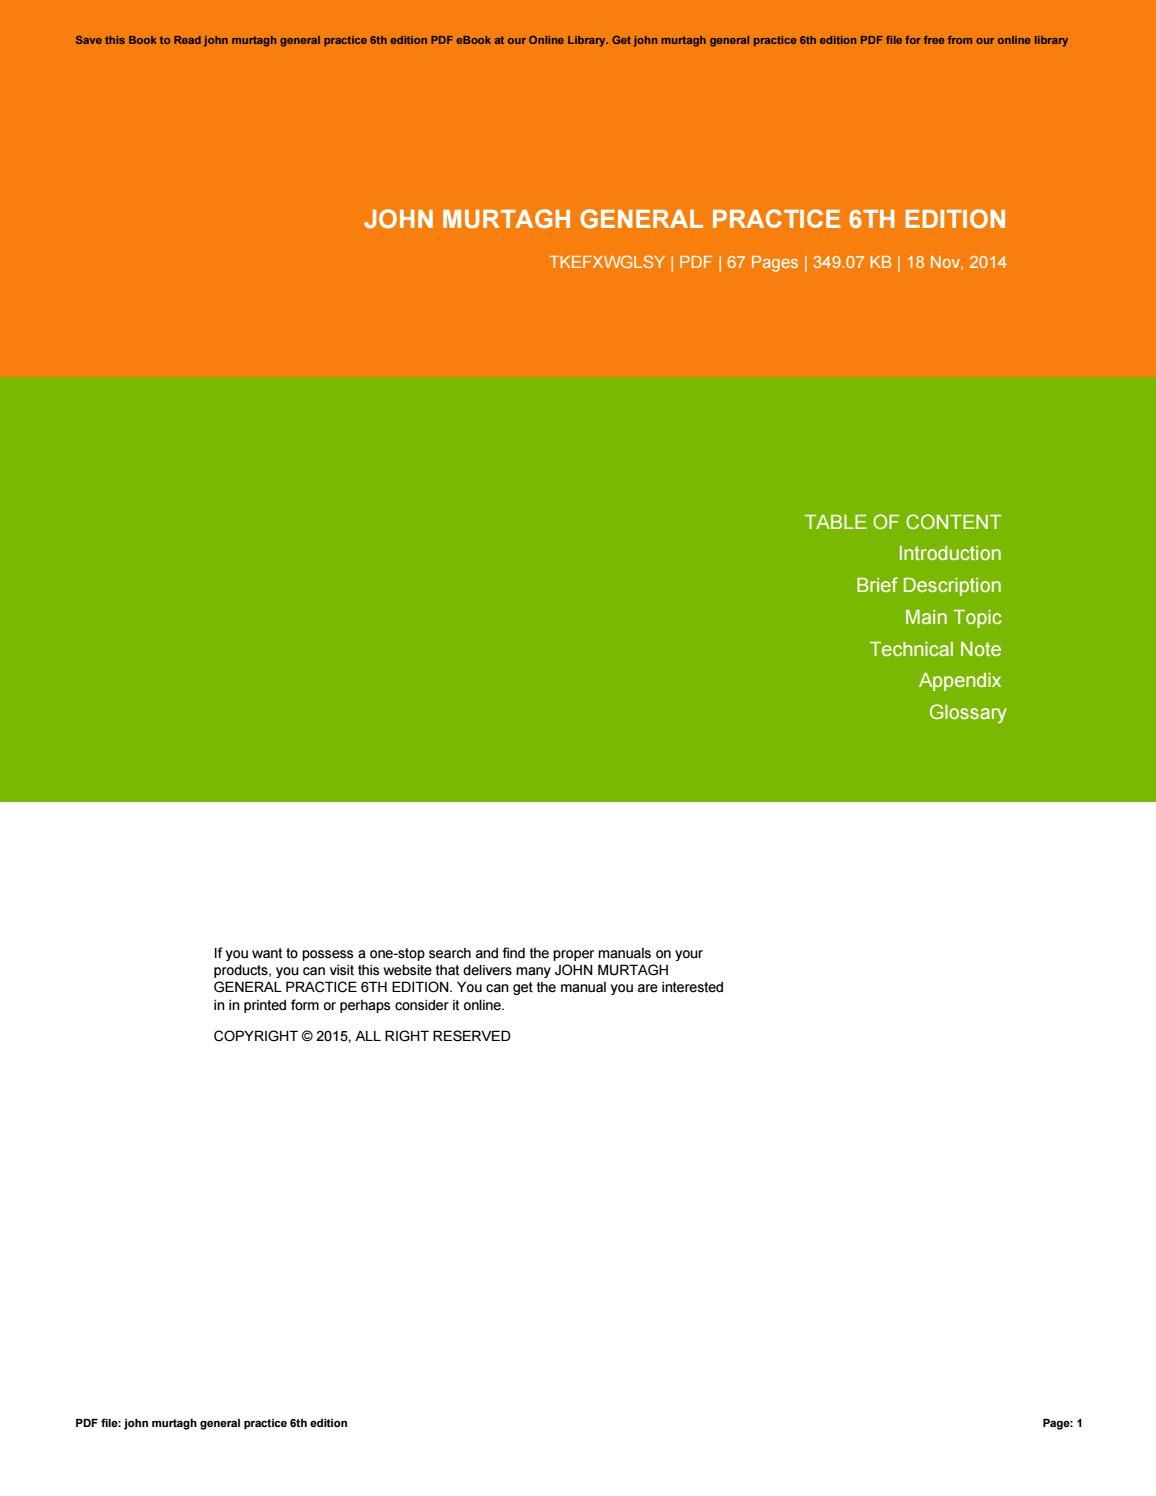 Murtagh General Practice Pdf